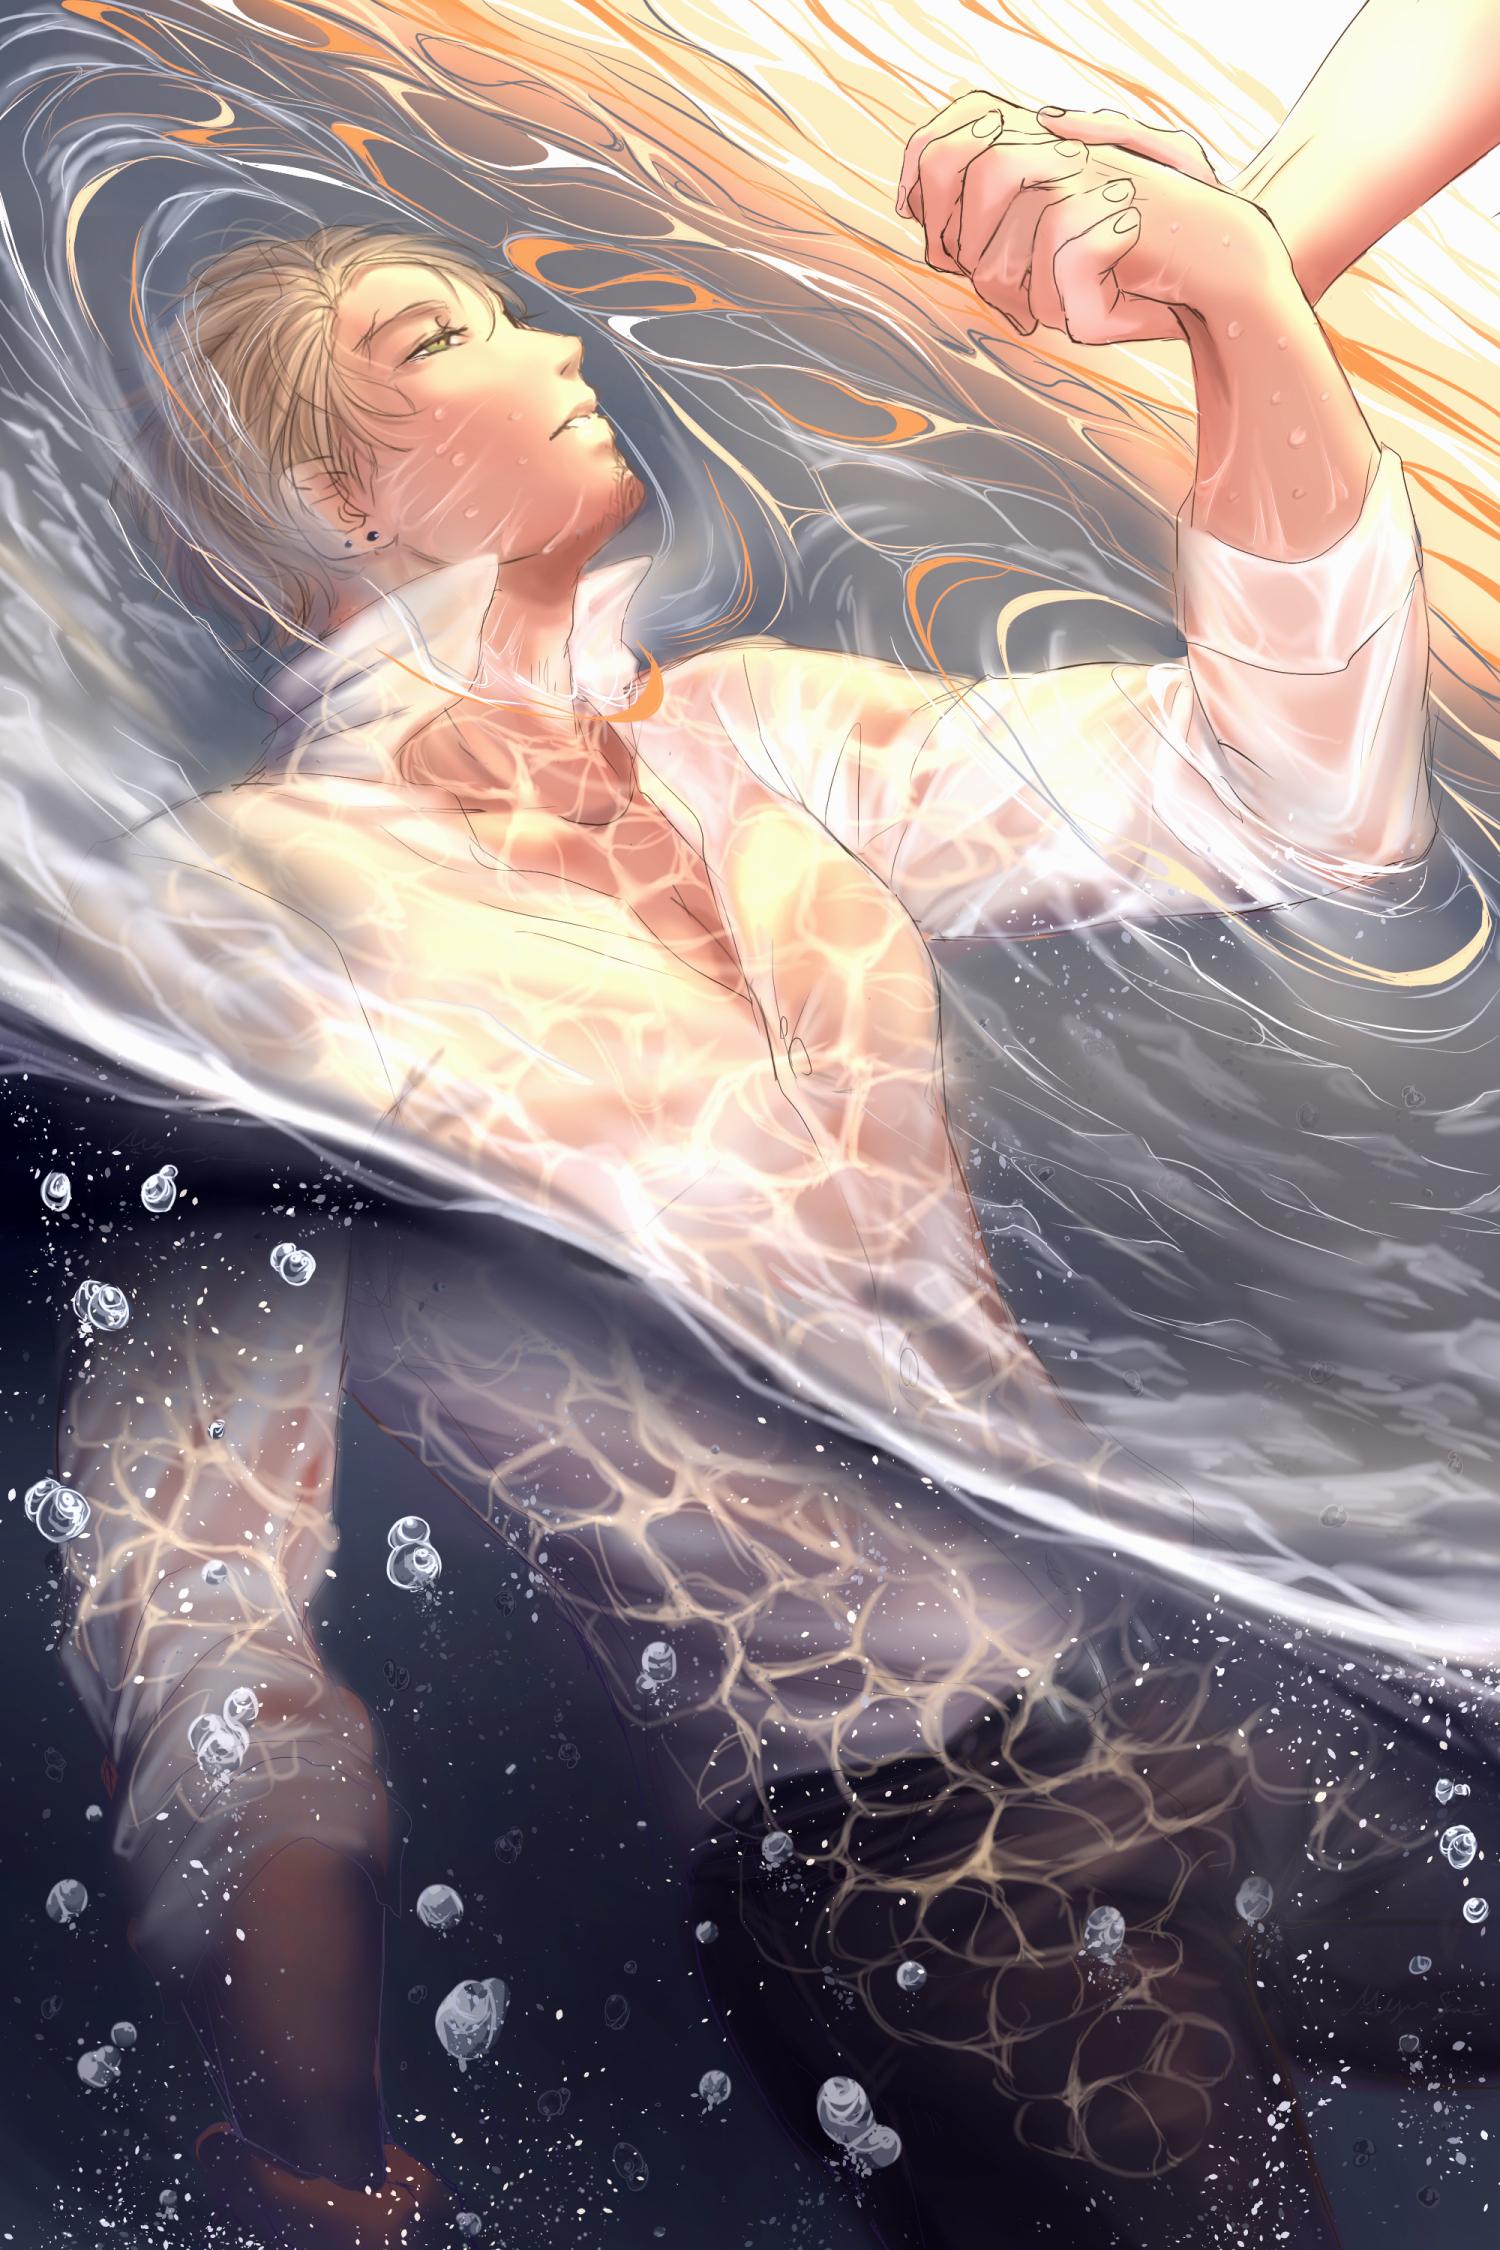 _c0s___drowning_by_meguru_sama-dbkkm6v.j